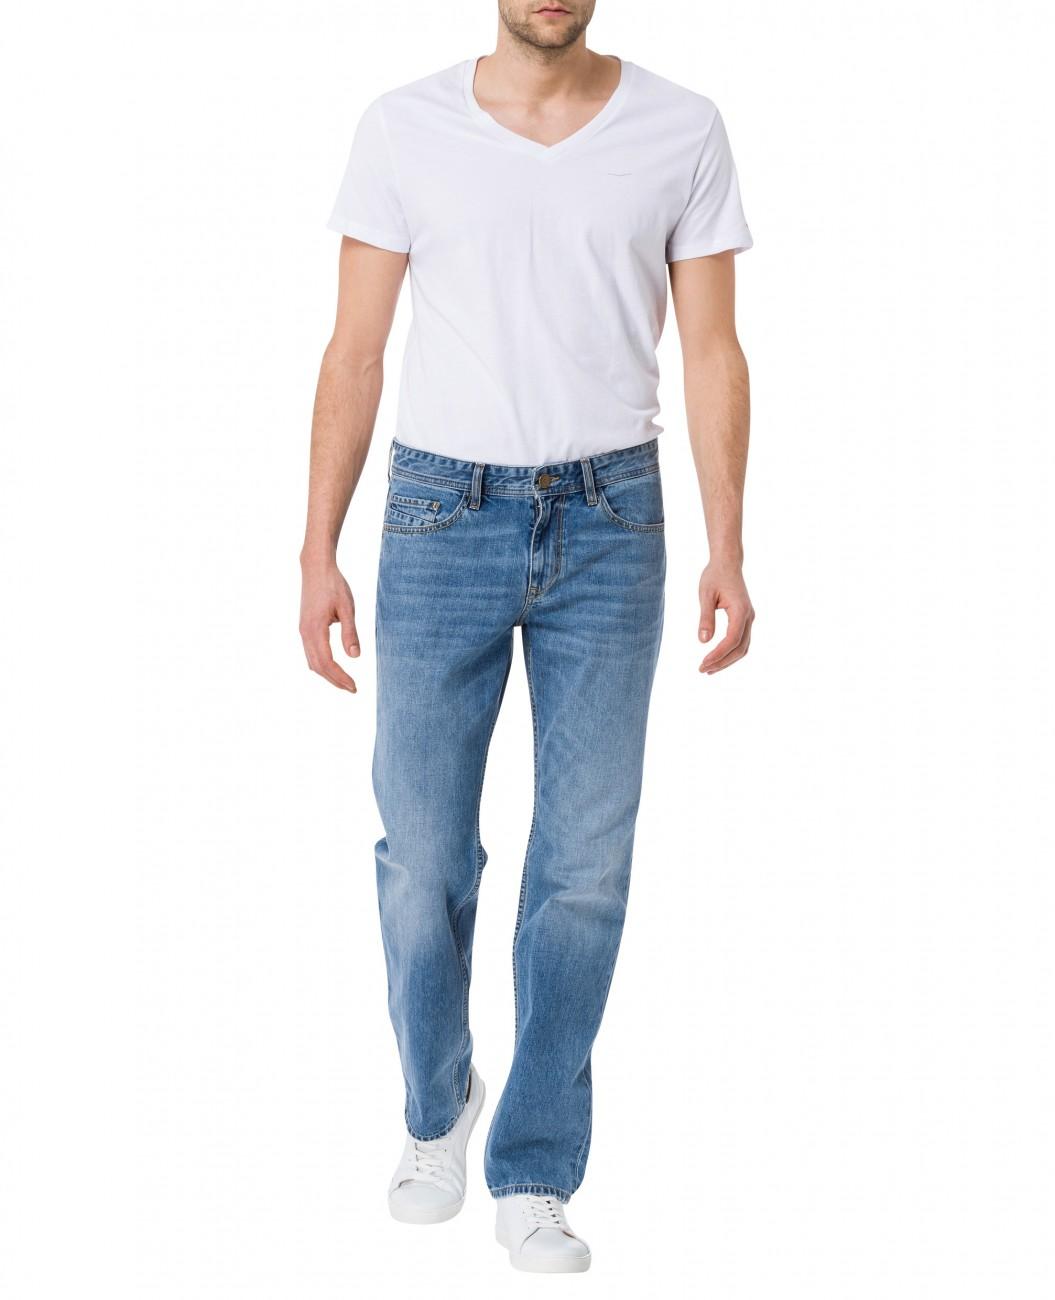 cross herren jeans antonio relax fit blau light blue ebay. Black Bedroom Furniture Sets. Home Design Ideas